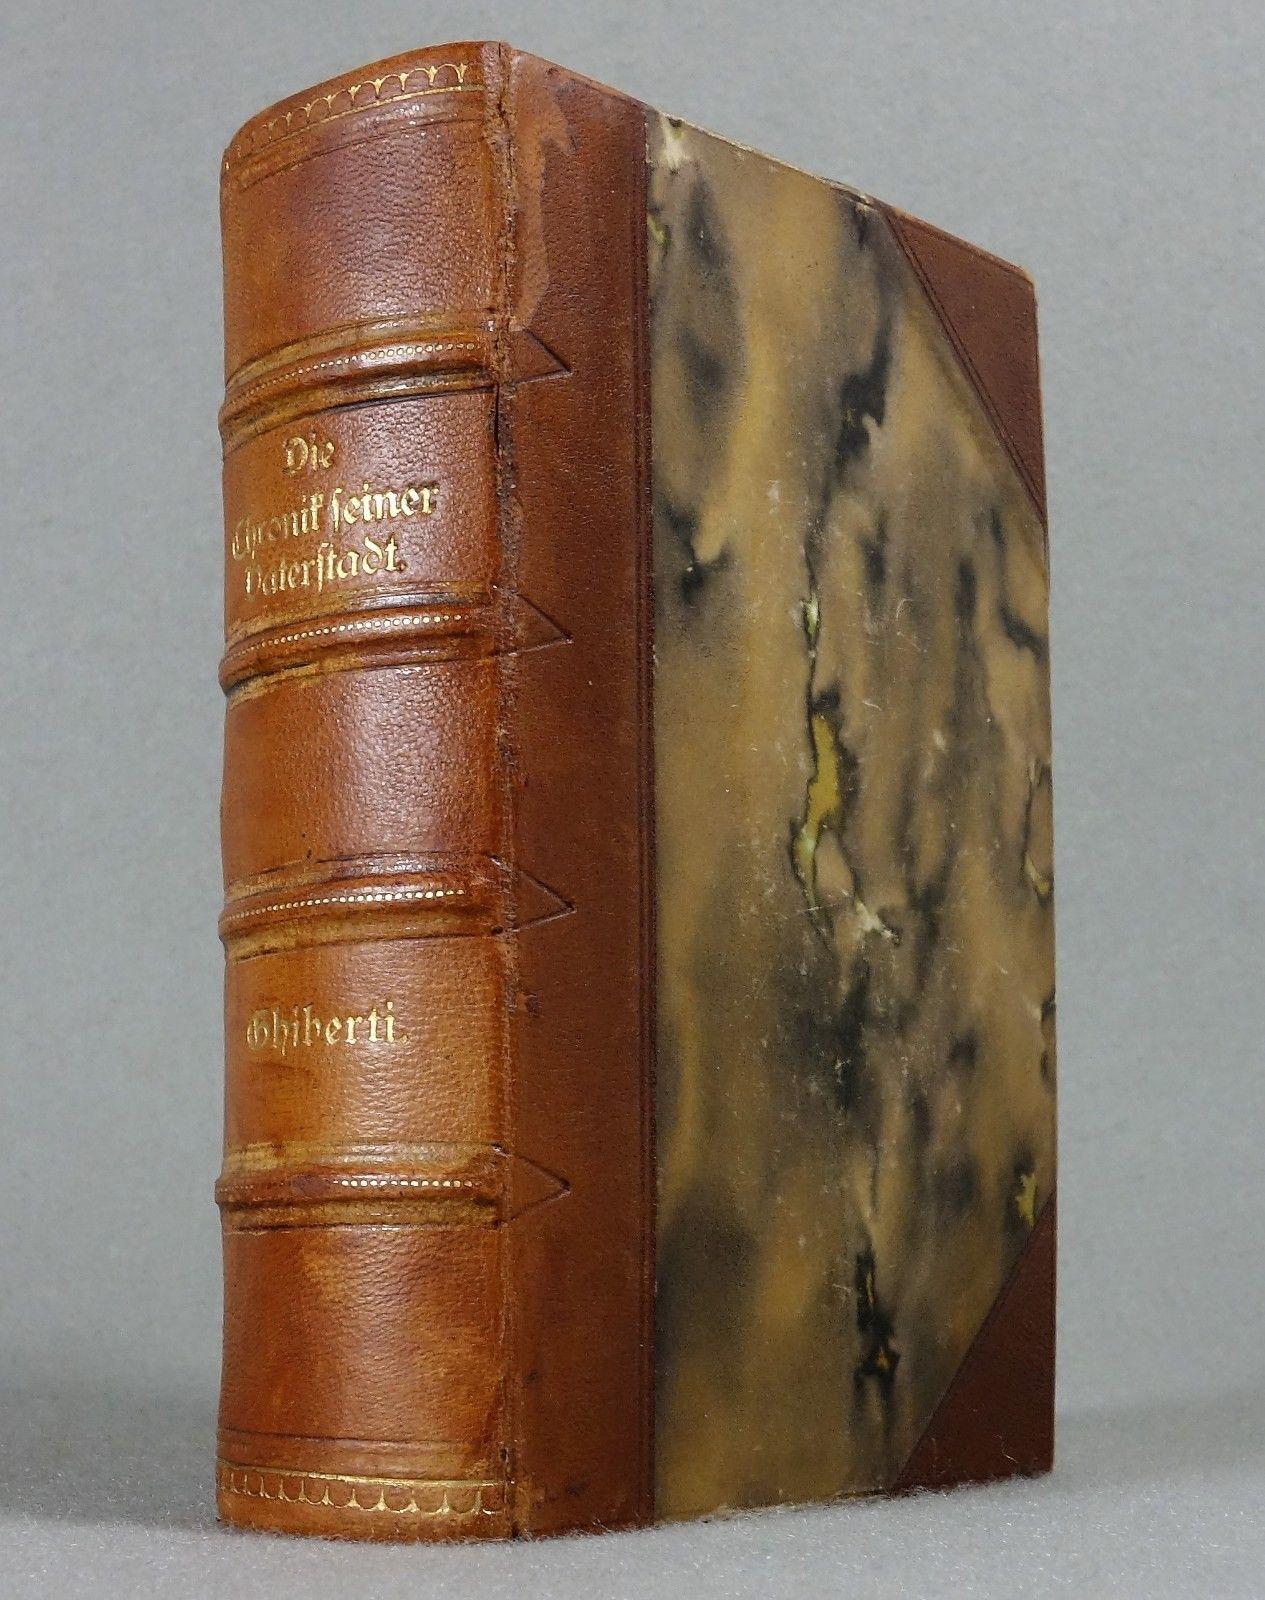 1833 - ROMANTIK - Lorenzo Ghiberti - ITALIEN Renaissance Florenz Leder - SELTEN